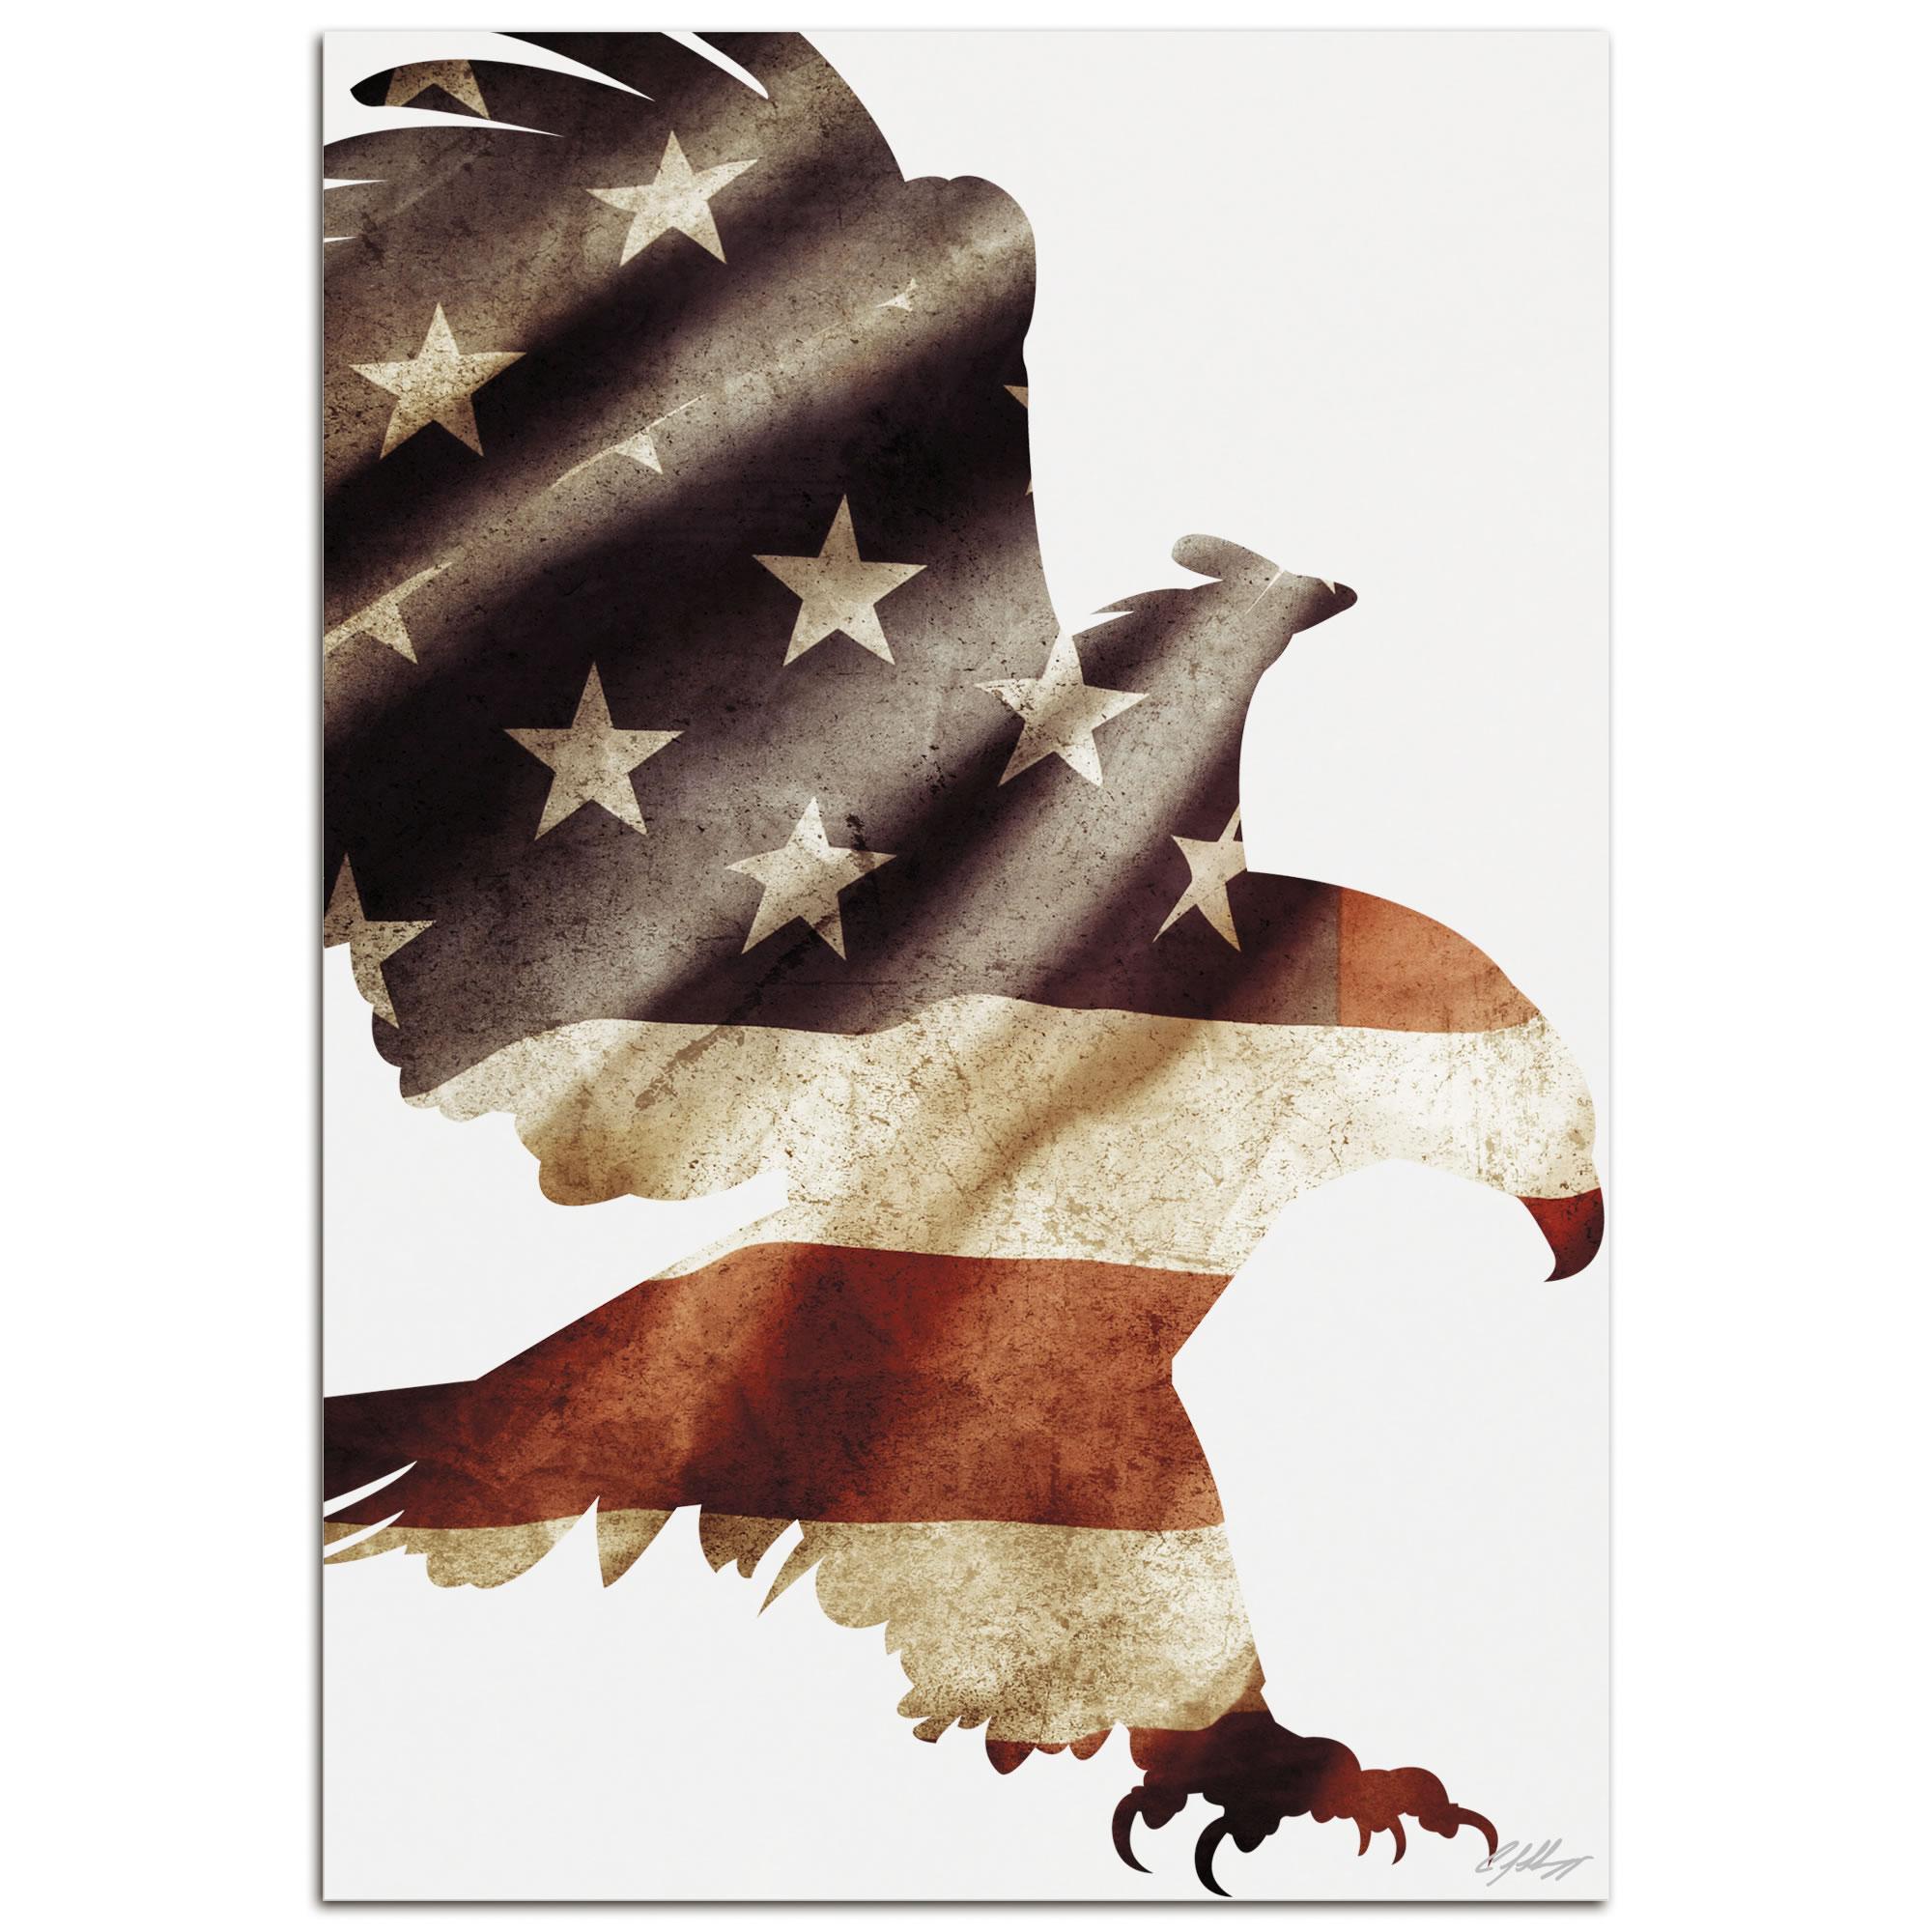 PATRIOT EAGLE - 32x22 in. Metal US Flag Print